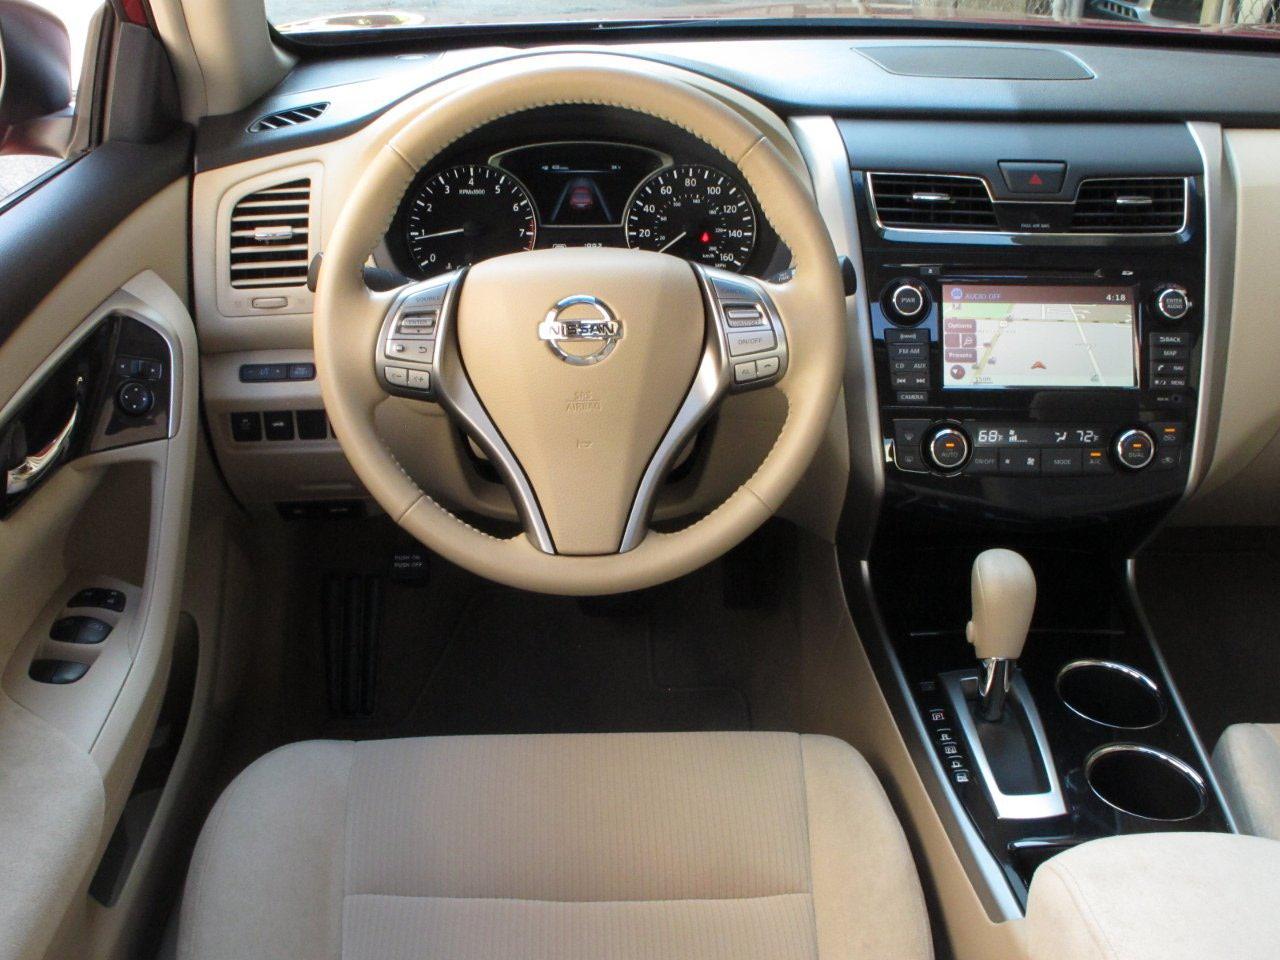 2013 Nissan Altima Image 11